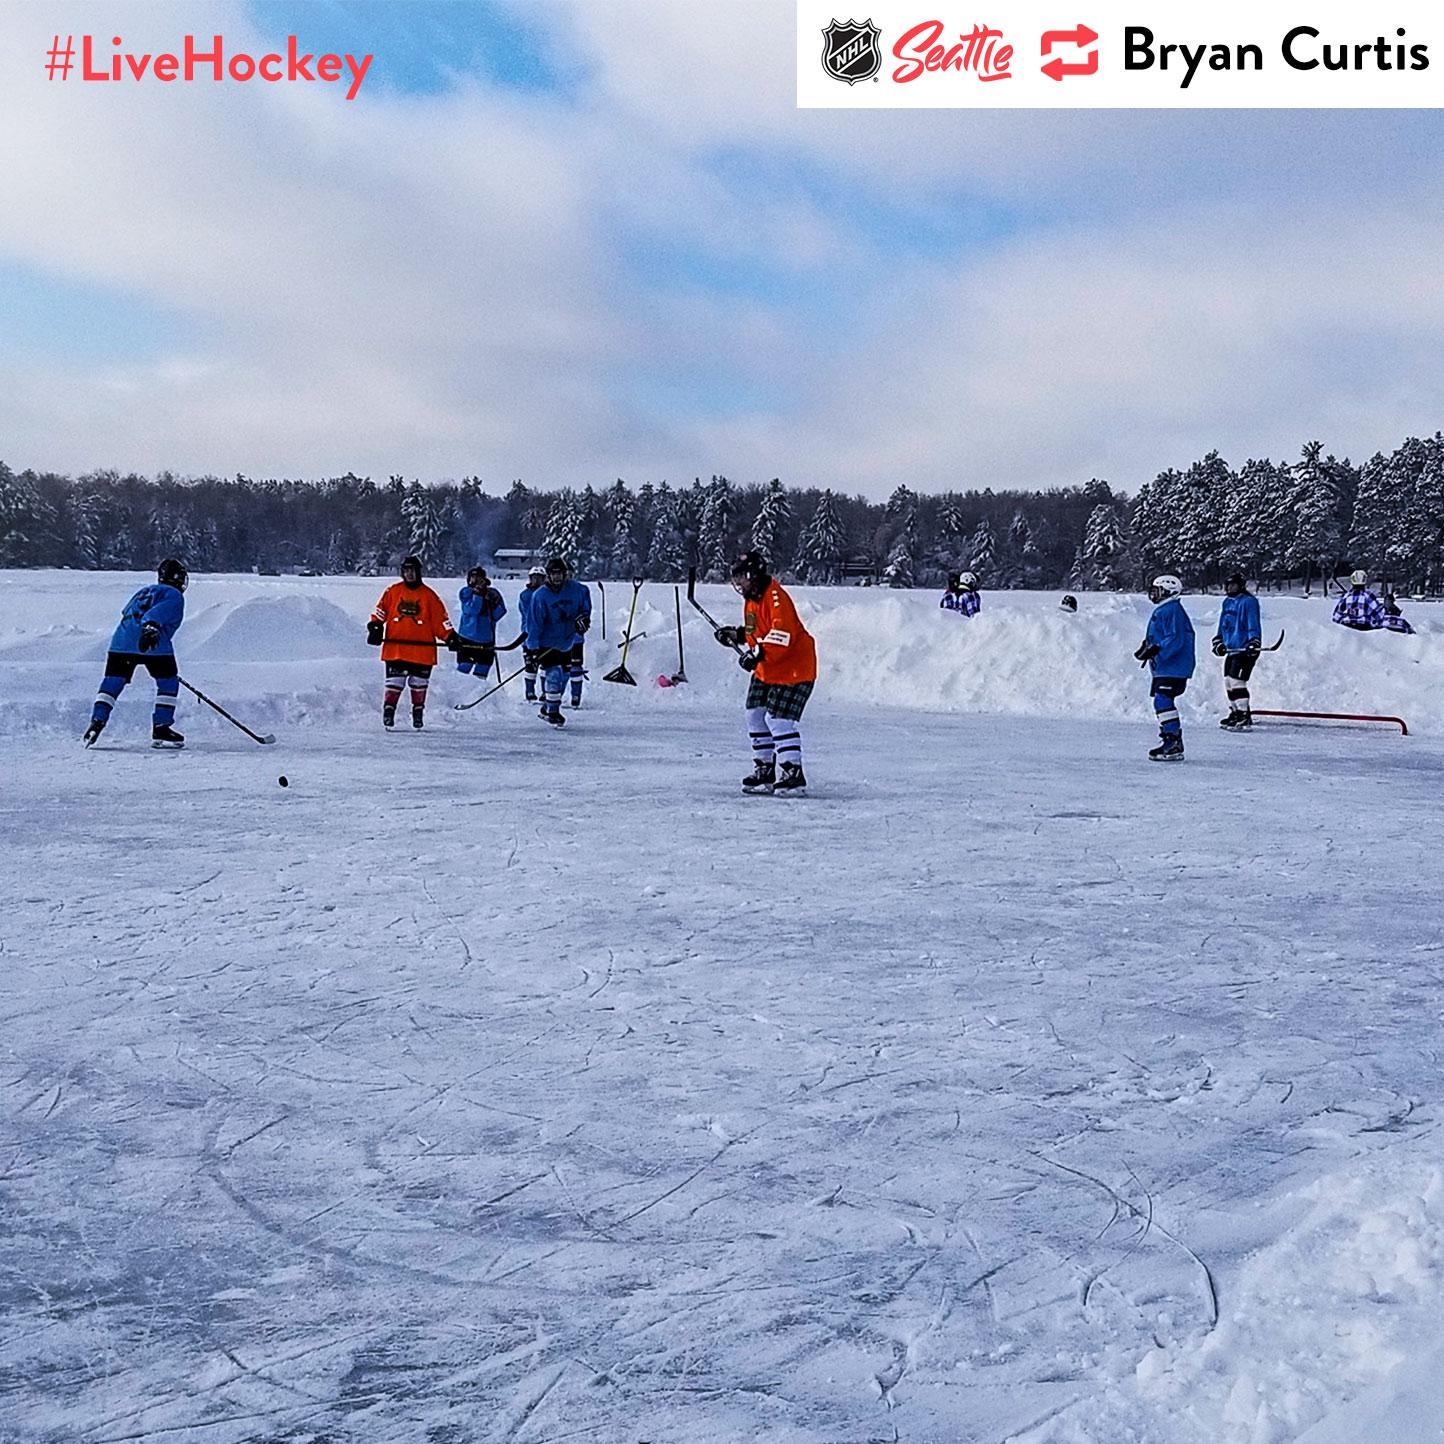 """Pond Hockey at 21 below zero in Wisconsin!"""